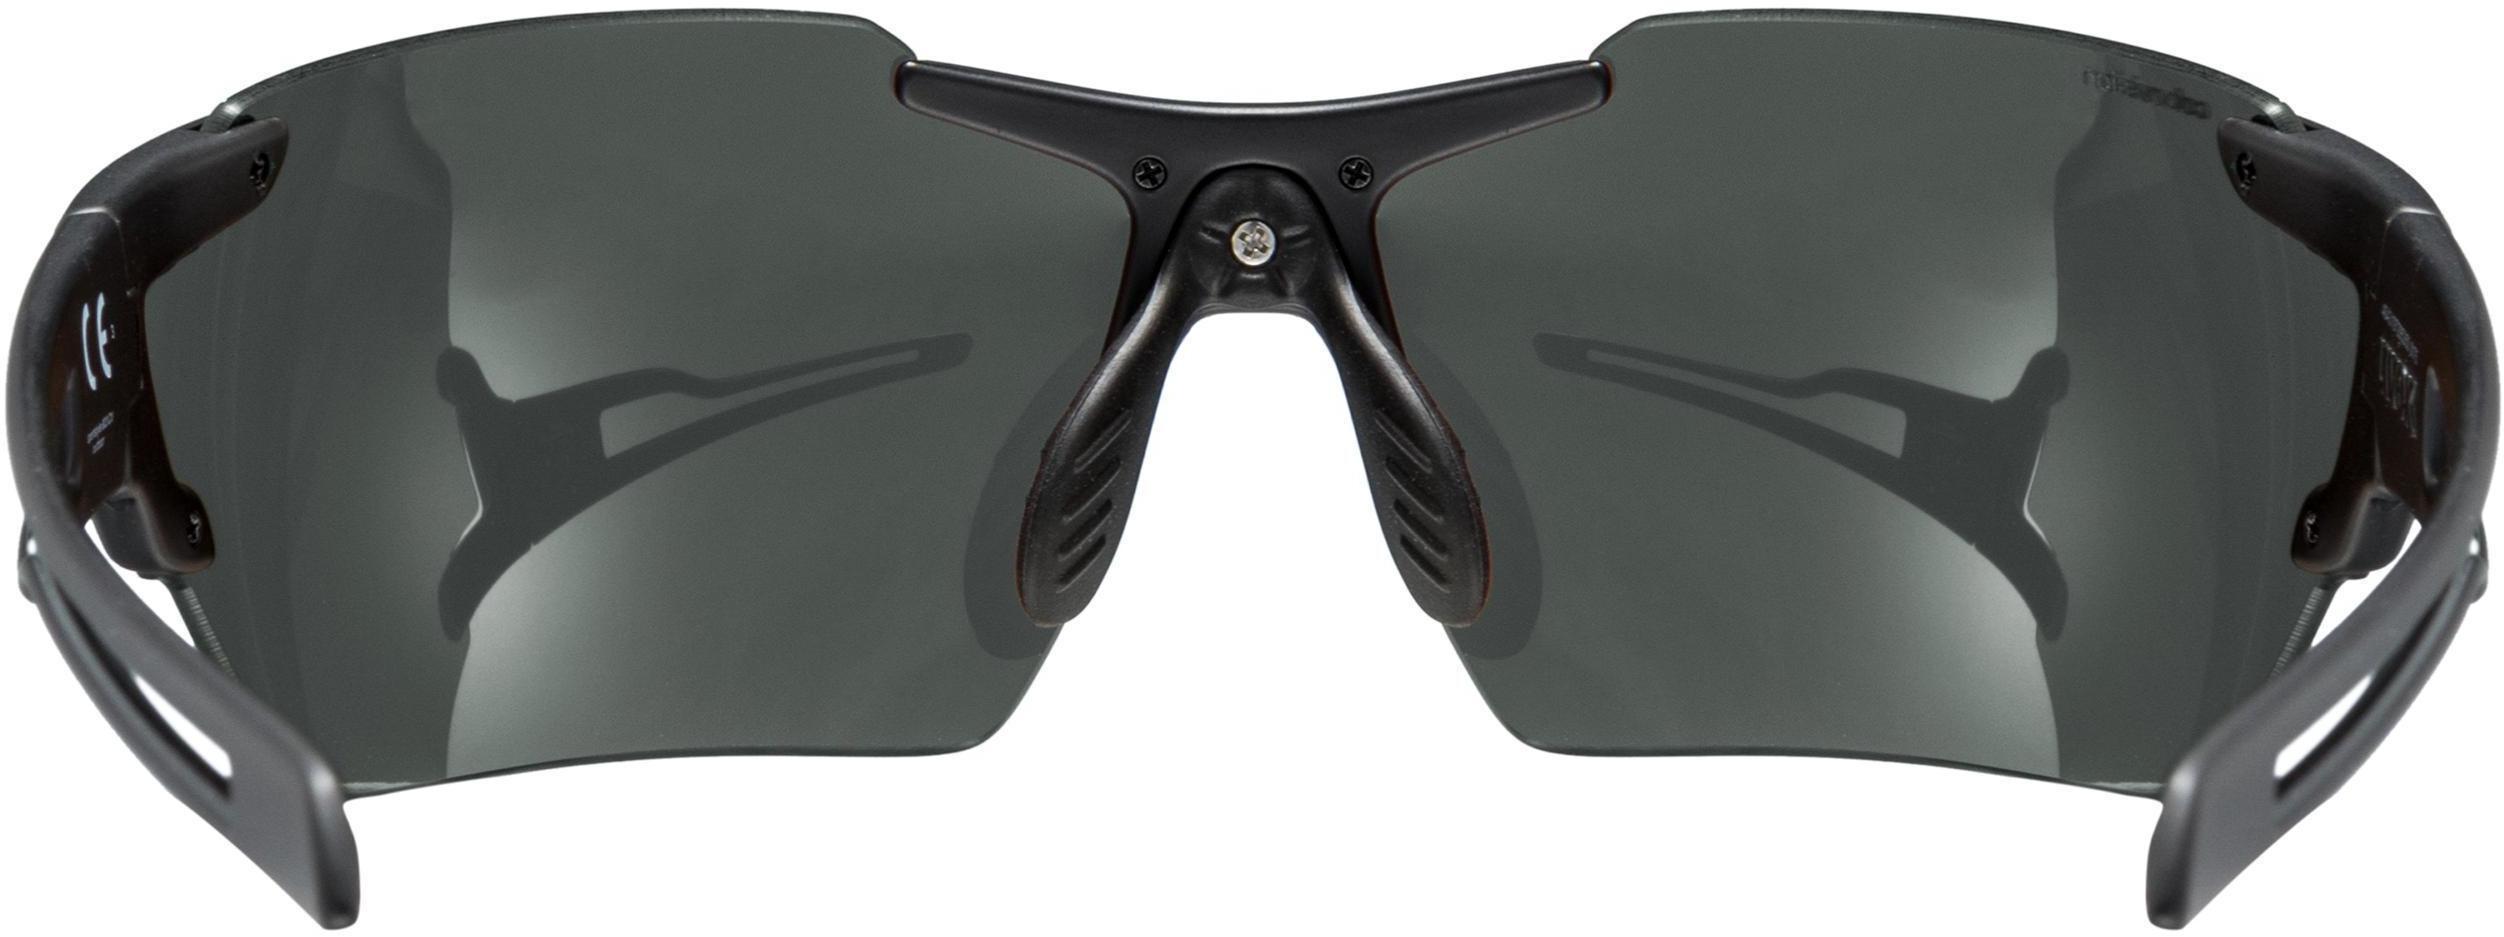 a077eb39b67c UVEX Sportstyle 803 Colorvision Bike Glasses black at Addnature.co.uk